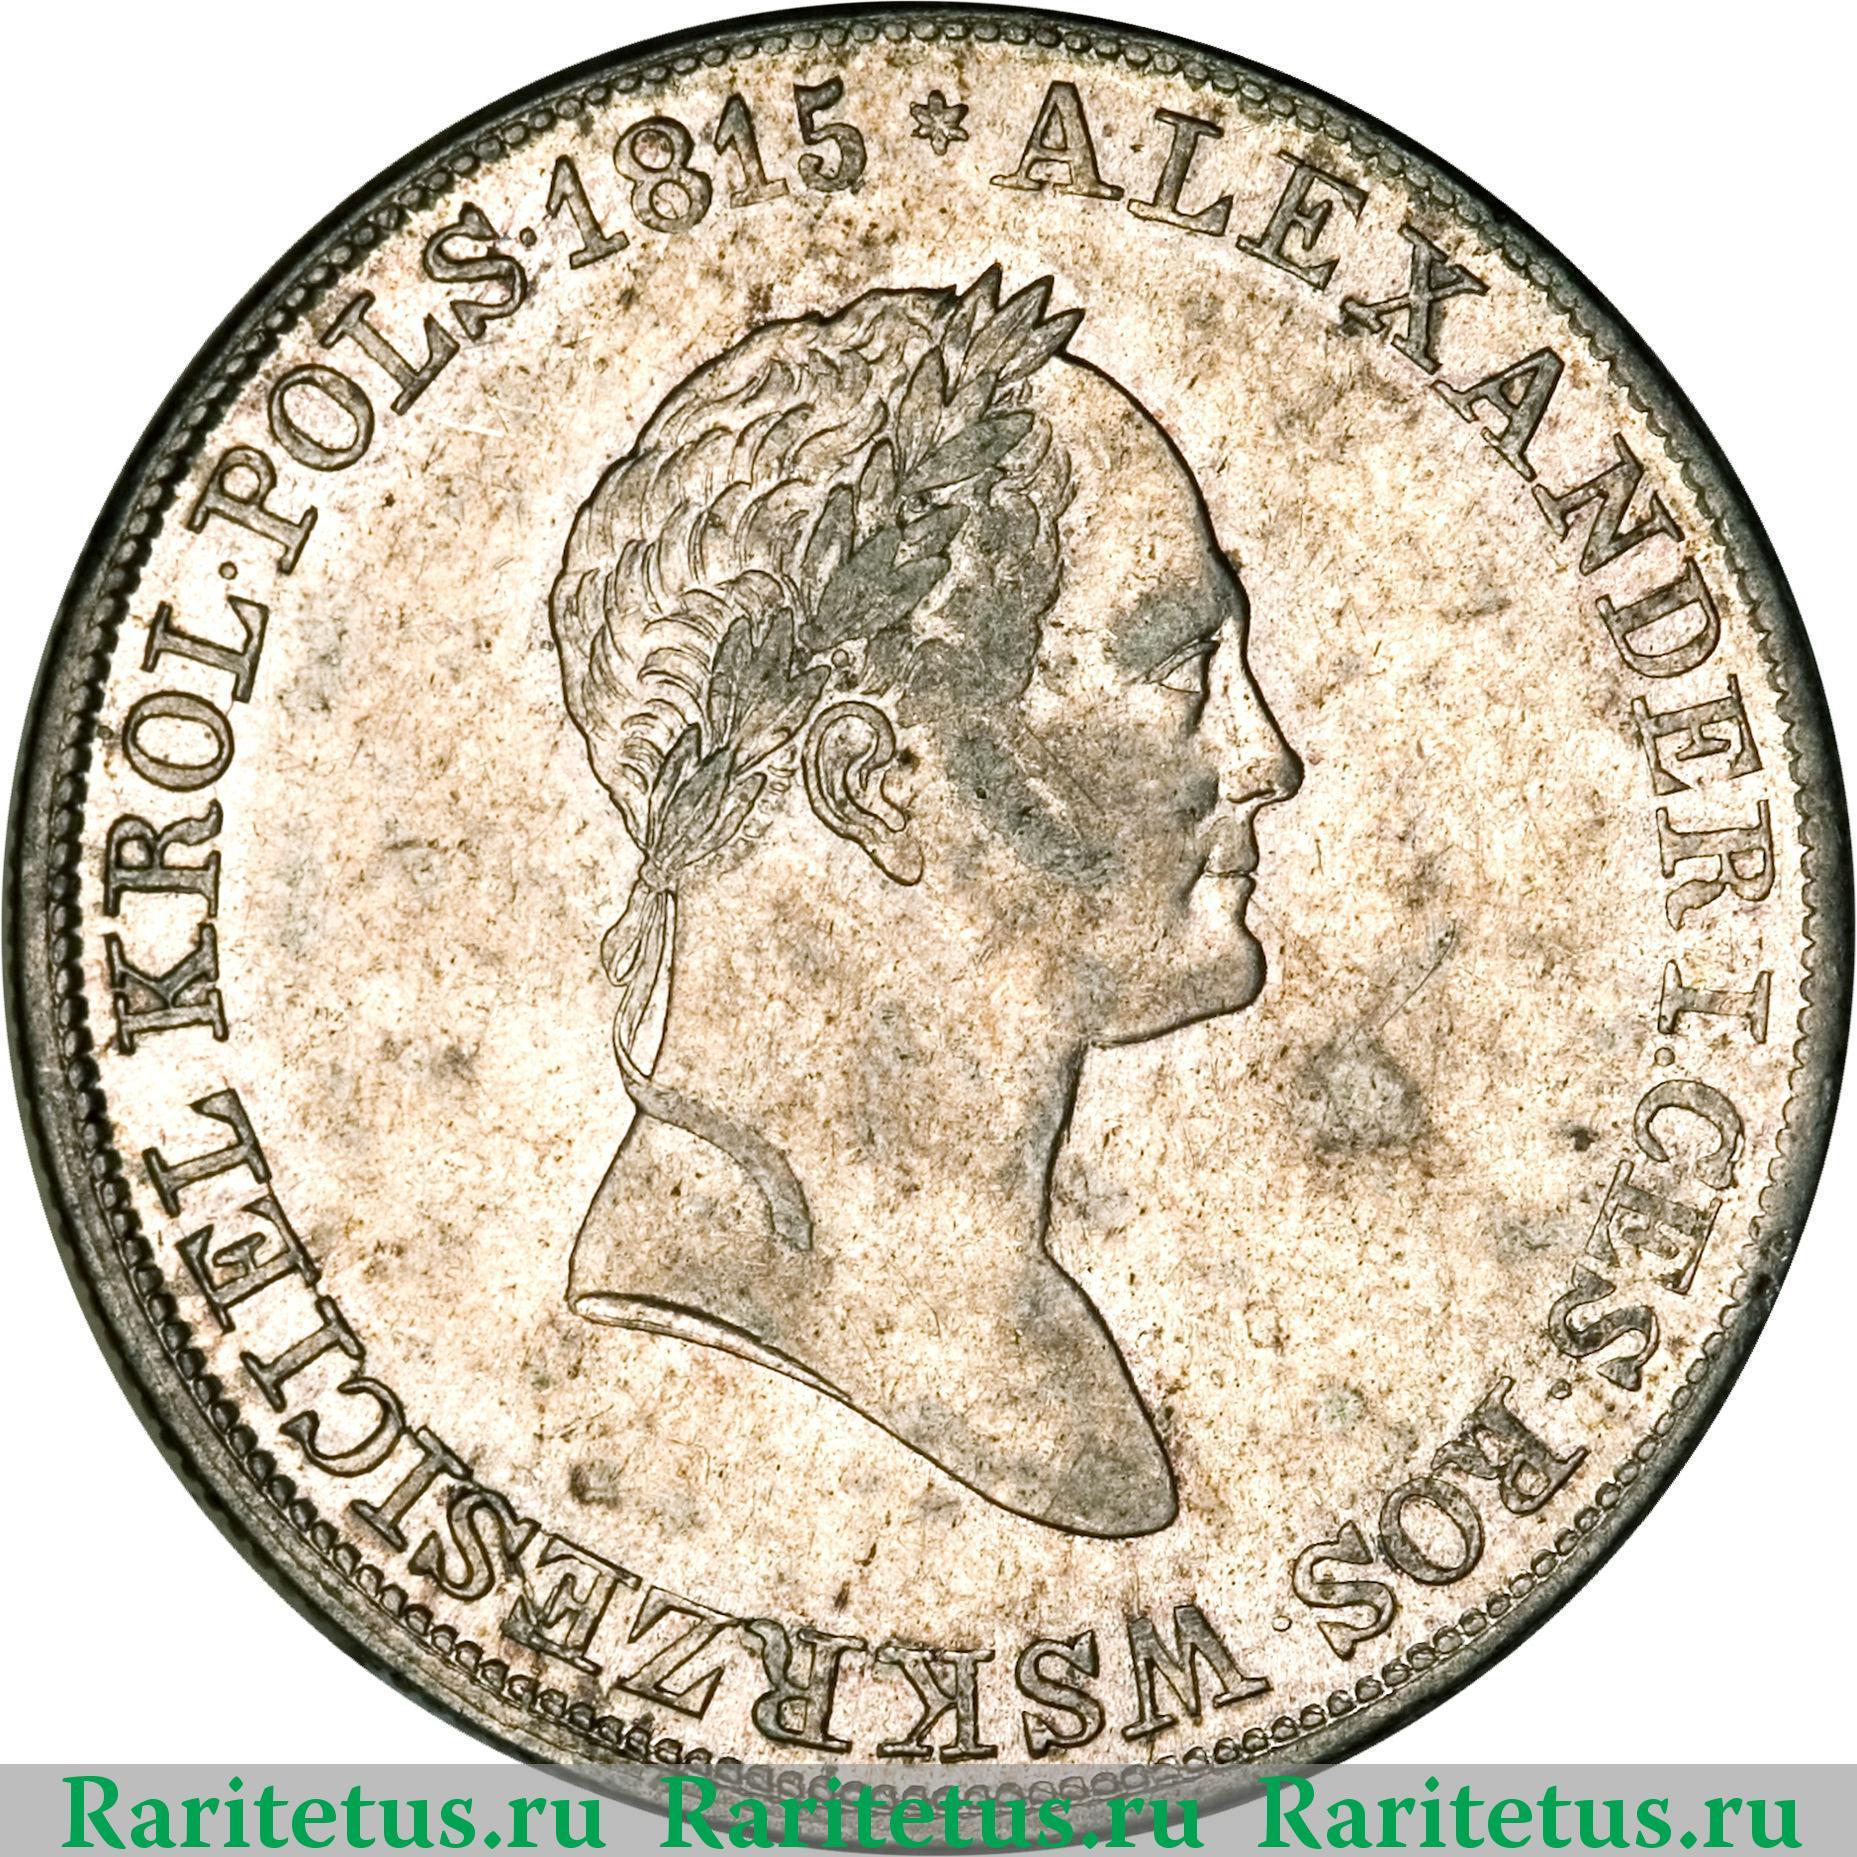 Цена монеты 5 злотых марка почта ссср 1978 цена